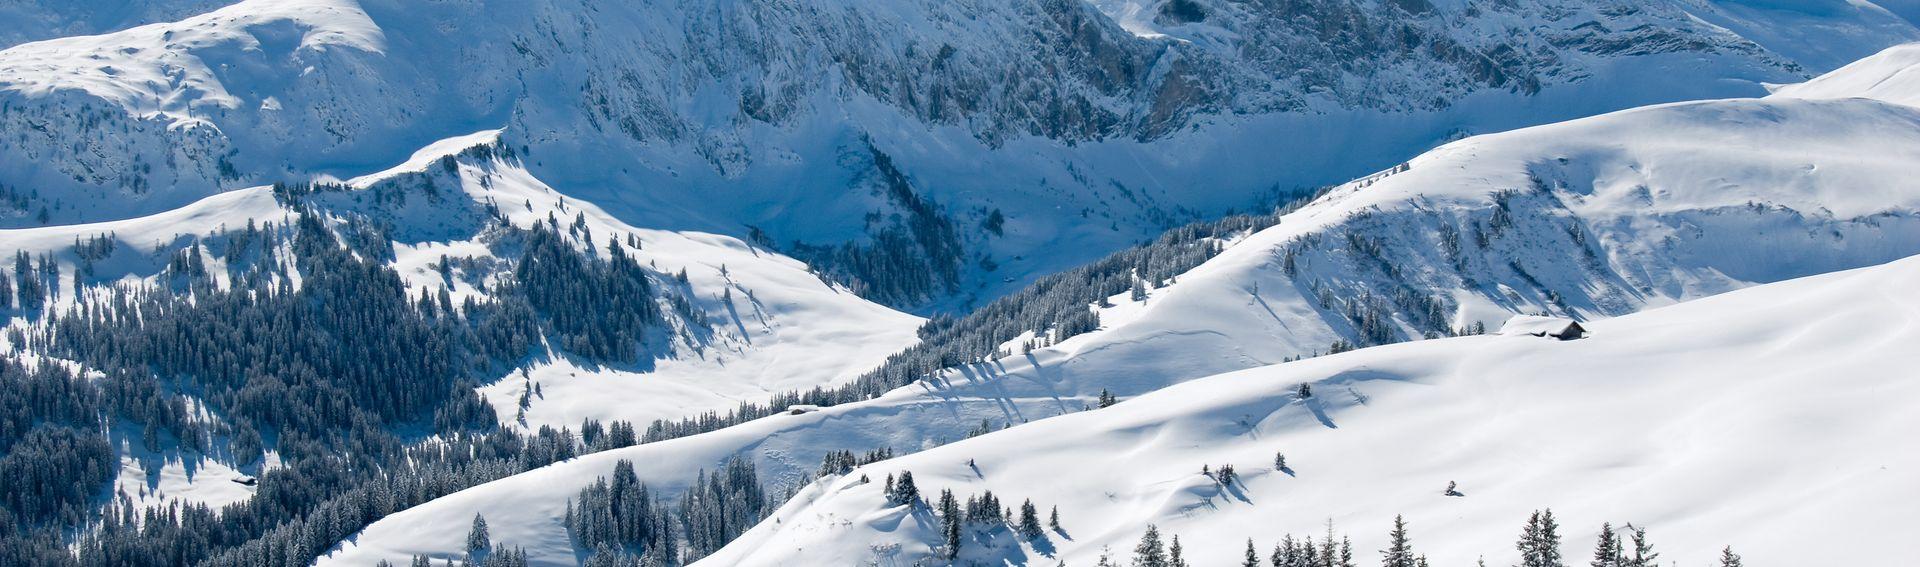 Région Berne & Oberland Bernois